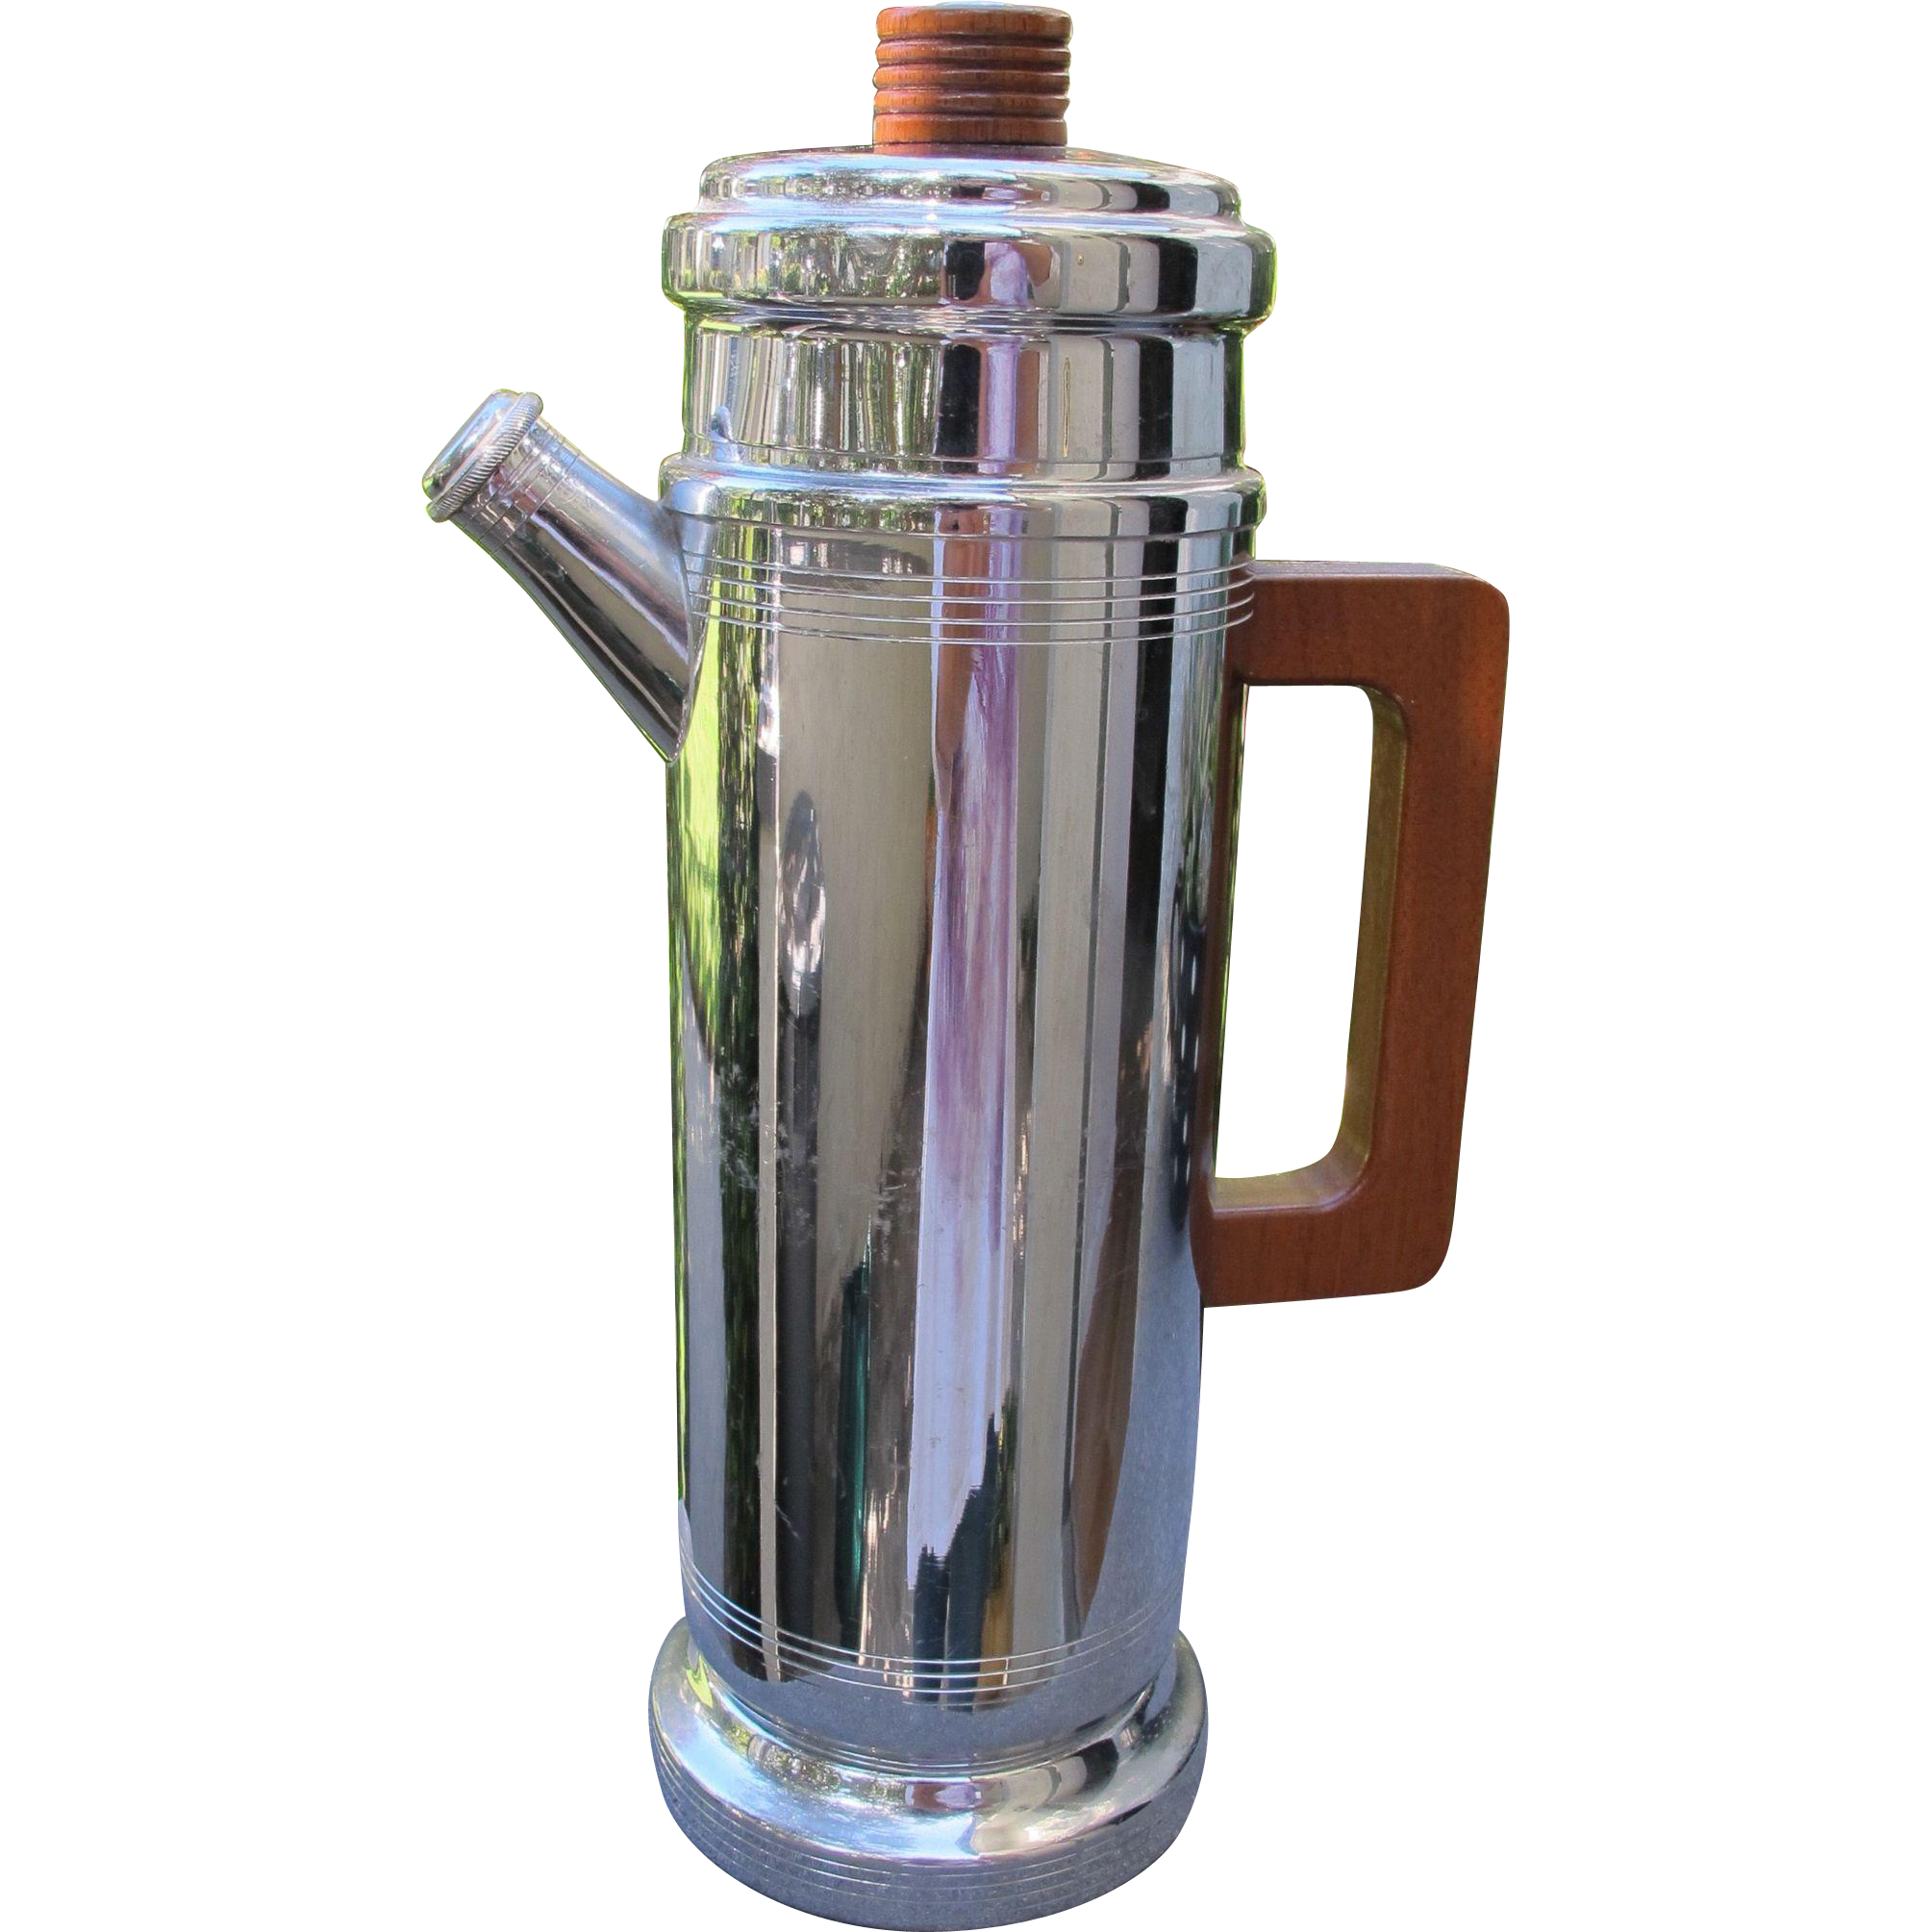 Deco Martini Shaker Chrome Resembles Coffee Pot